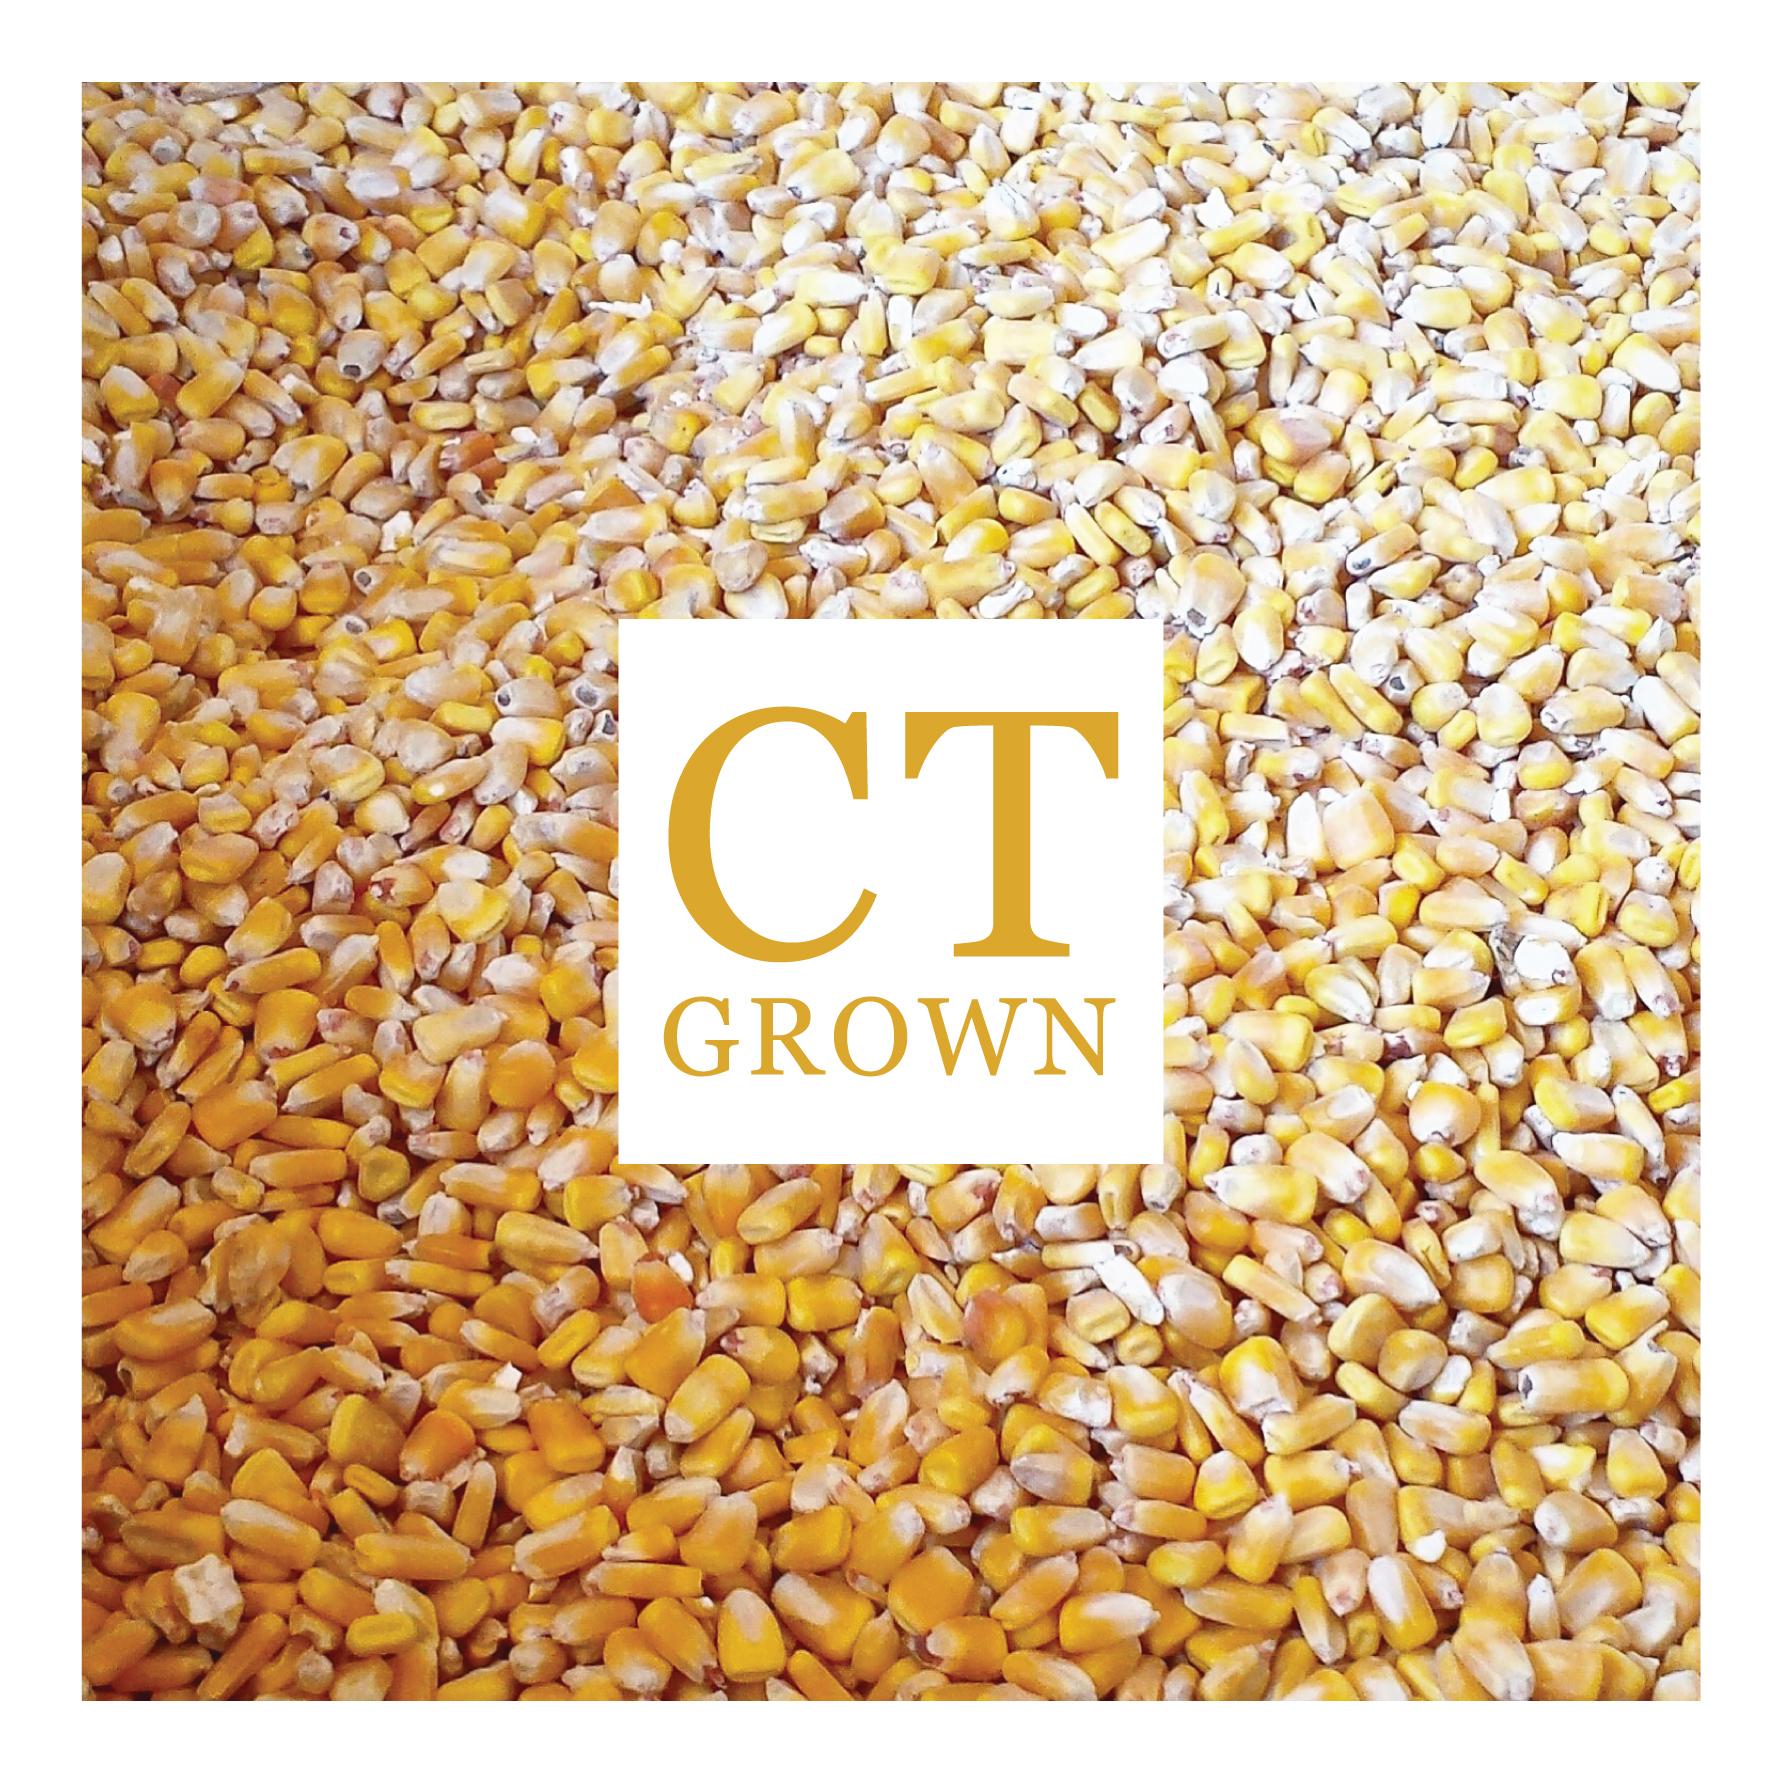 ct grown corn